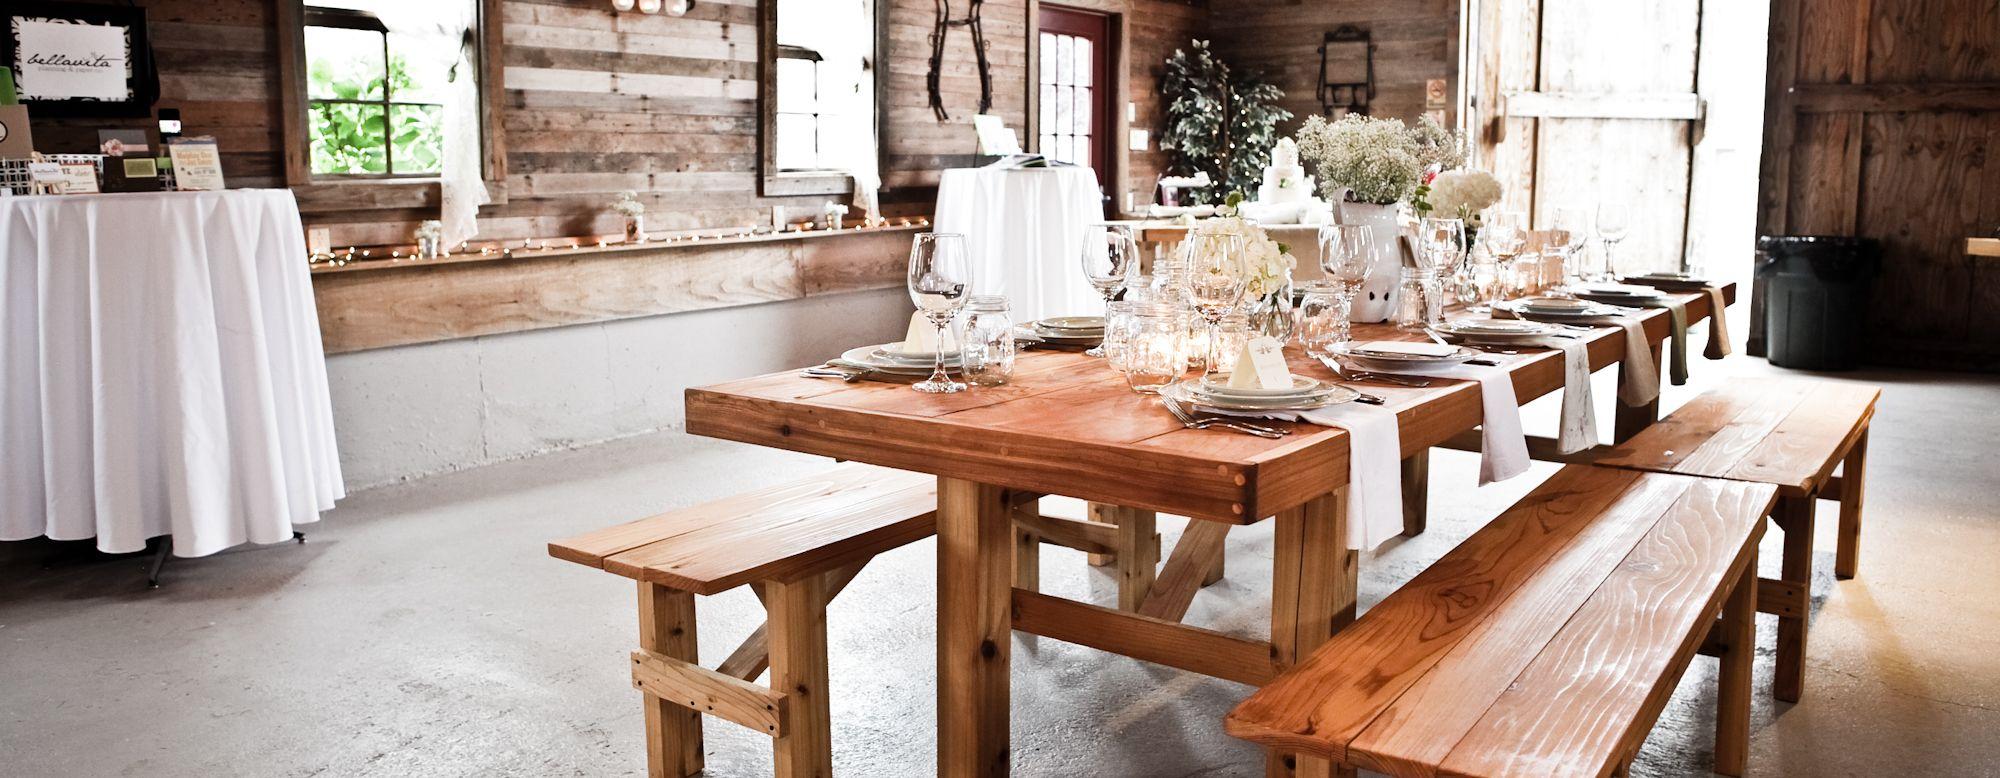 seattle farm tables wood table rentals seattle area farm tables